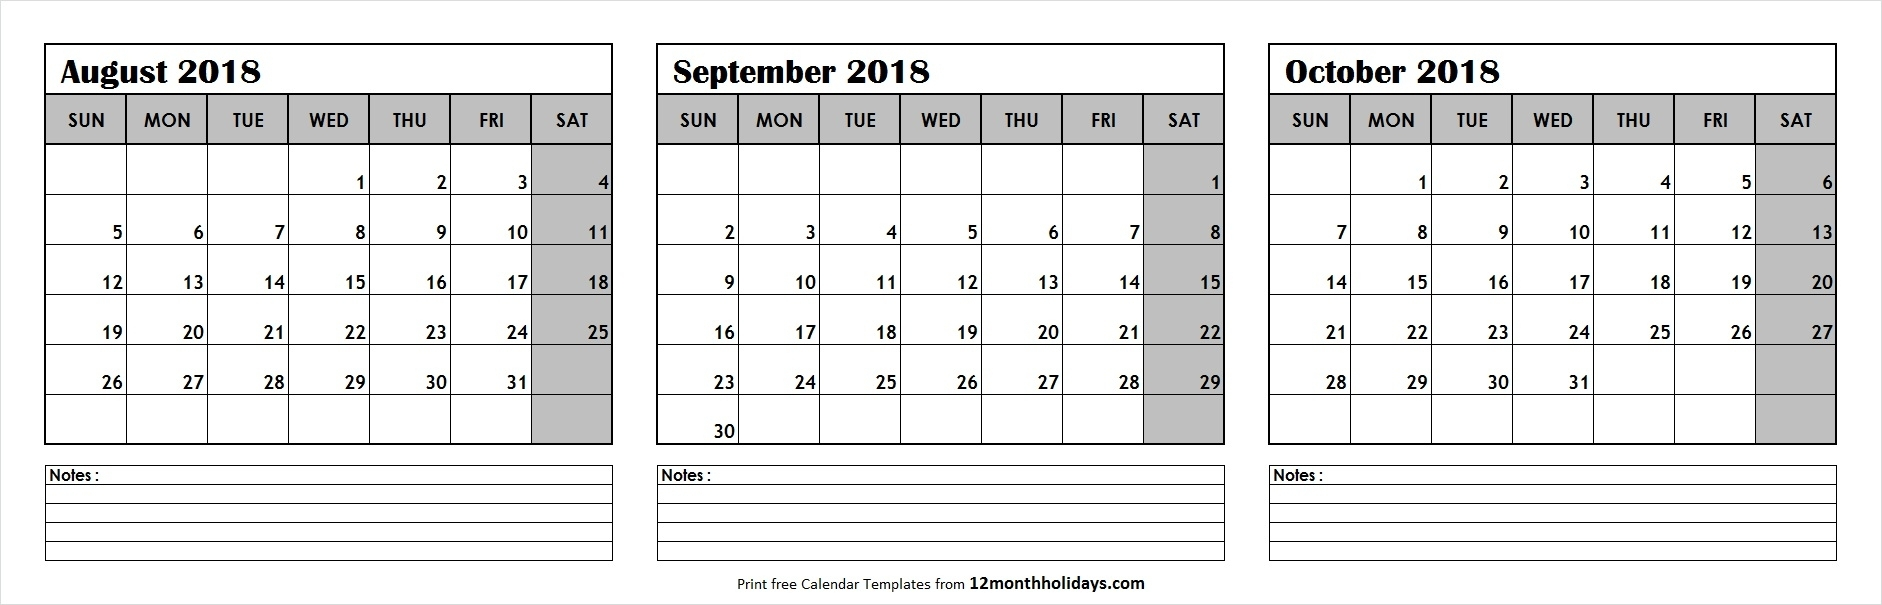 Get August Through October